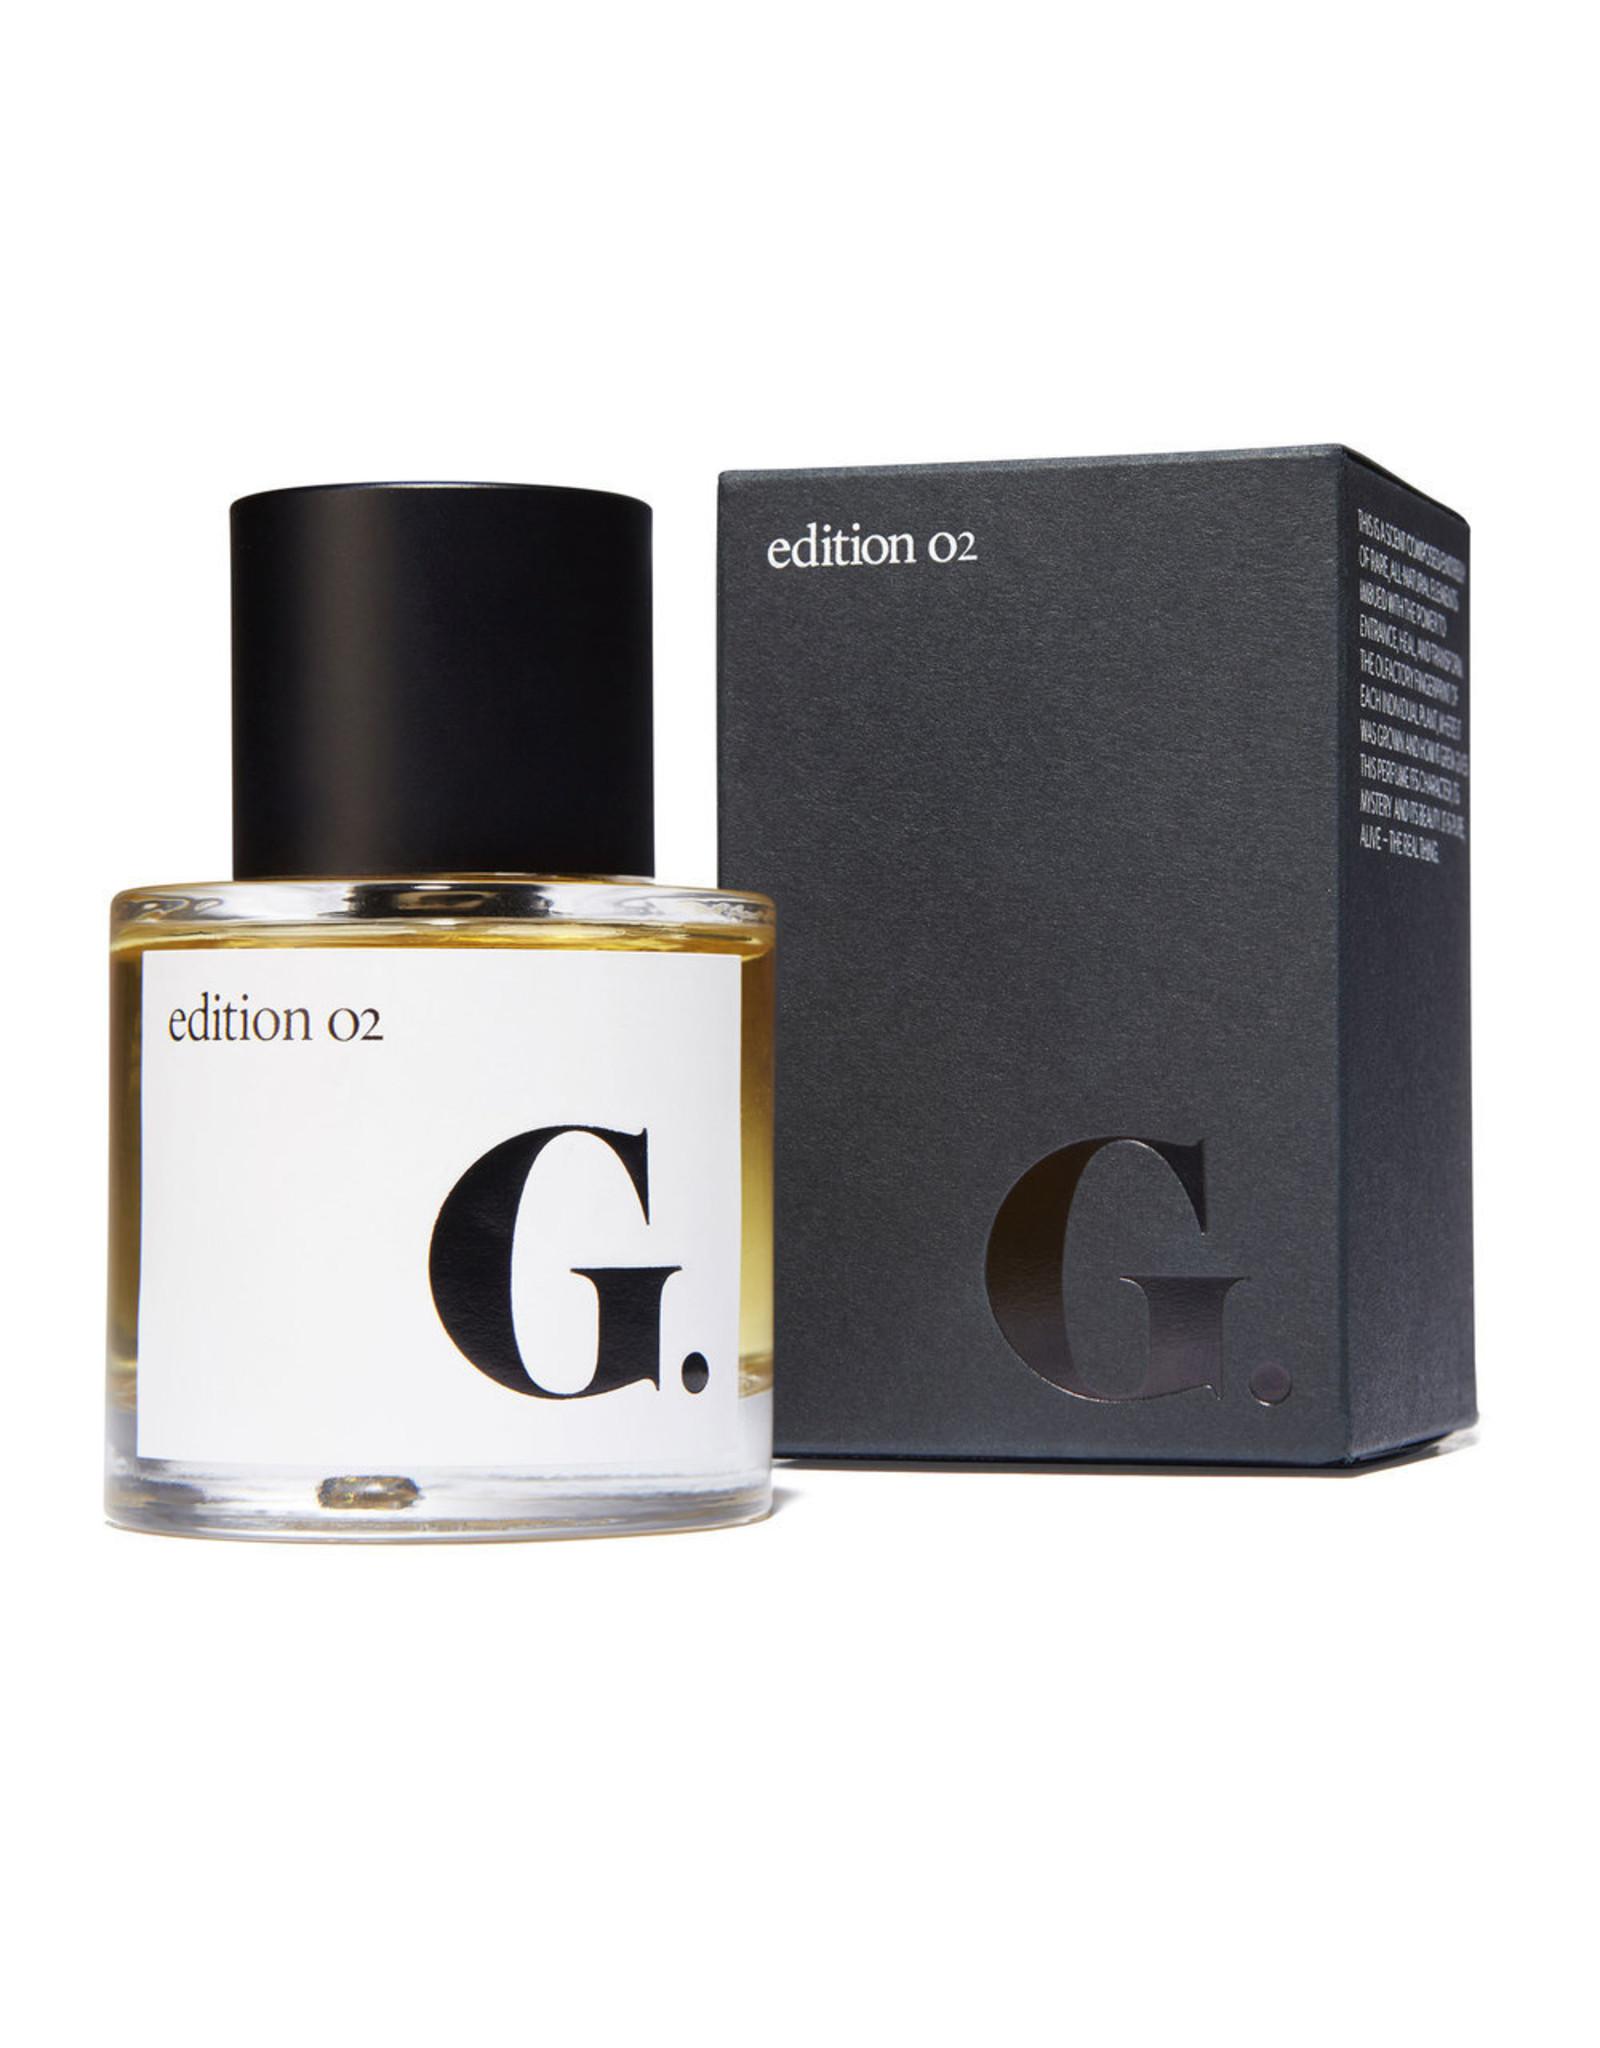 goop Beauty goop Beauty Eau De Parfum: Edition 02 - Shiso - 1.7 fl oz